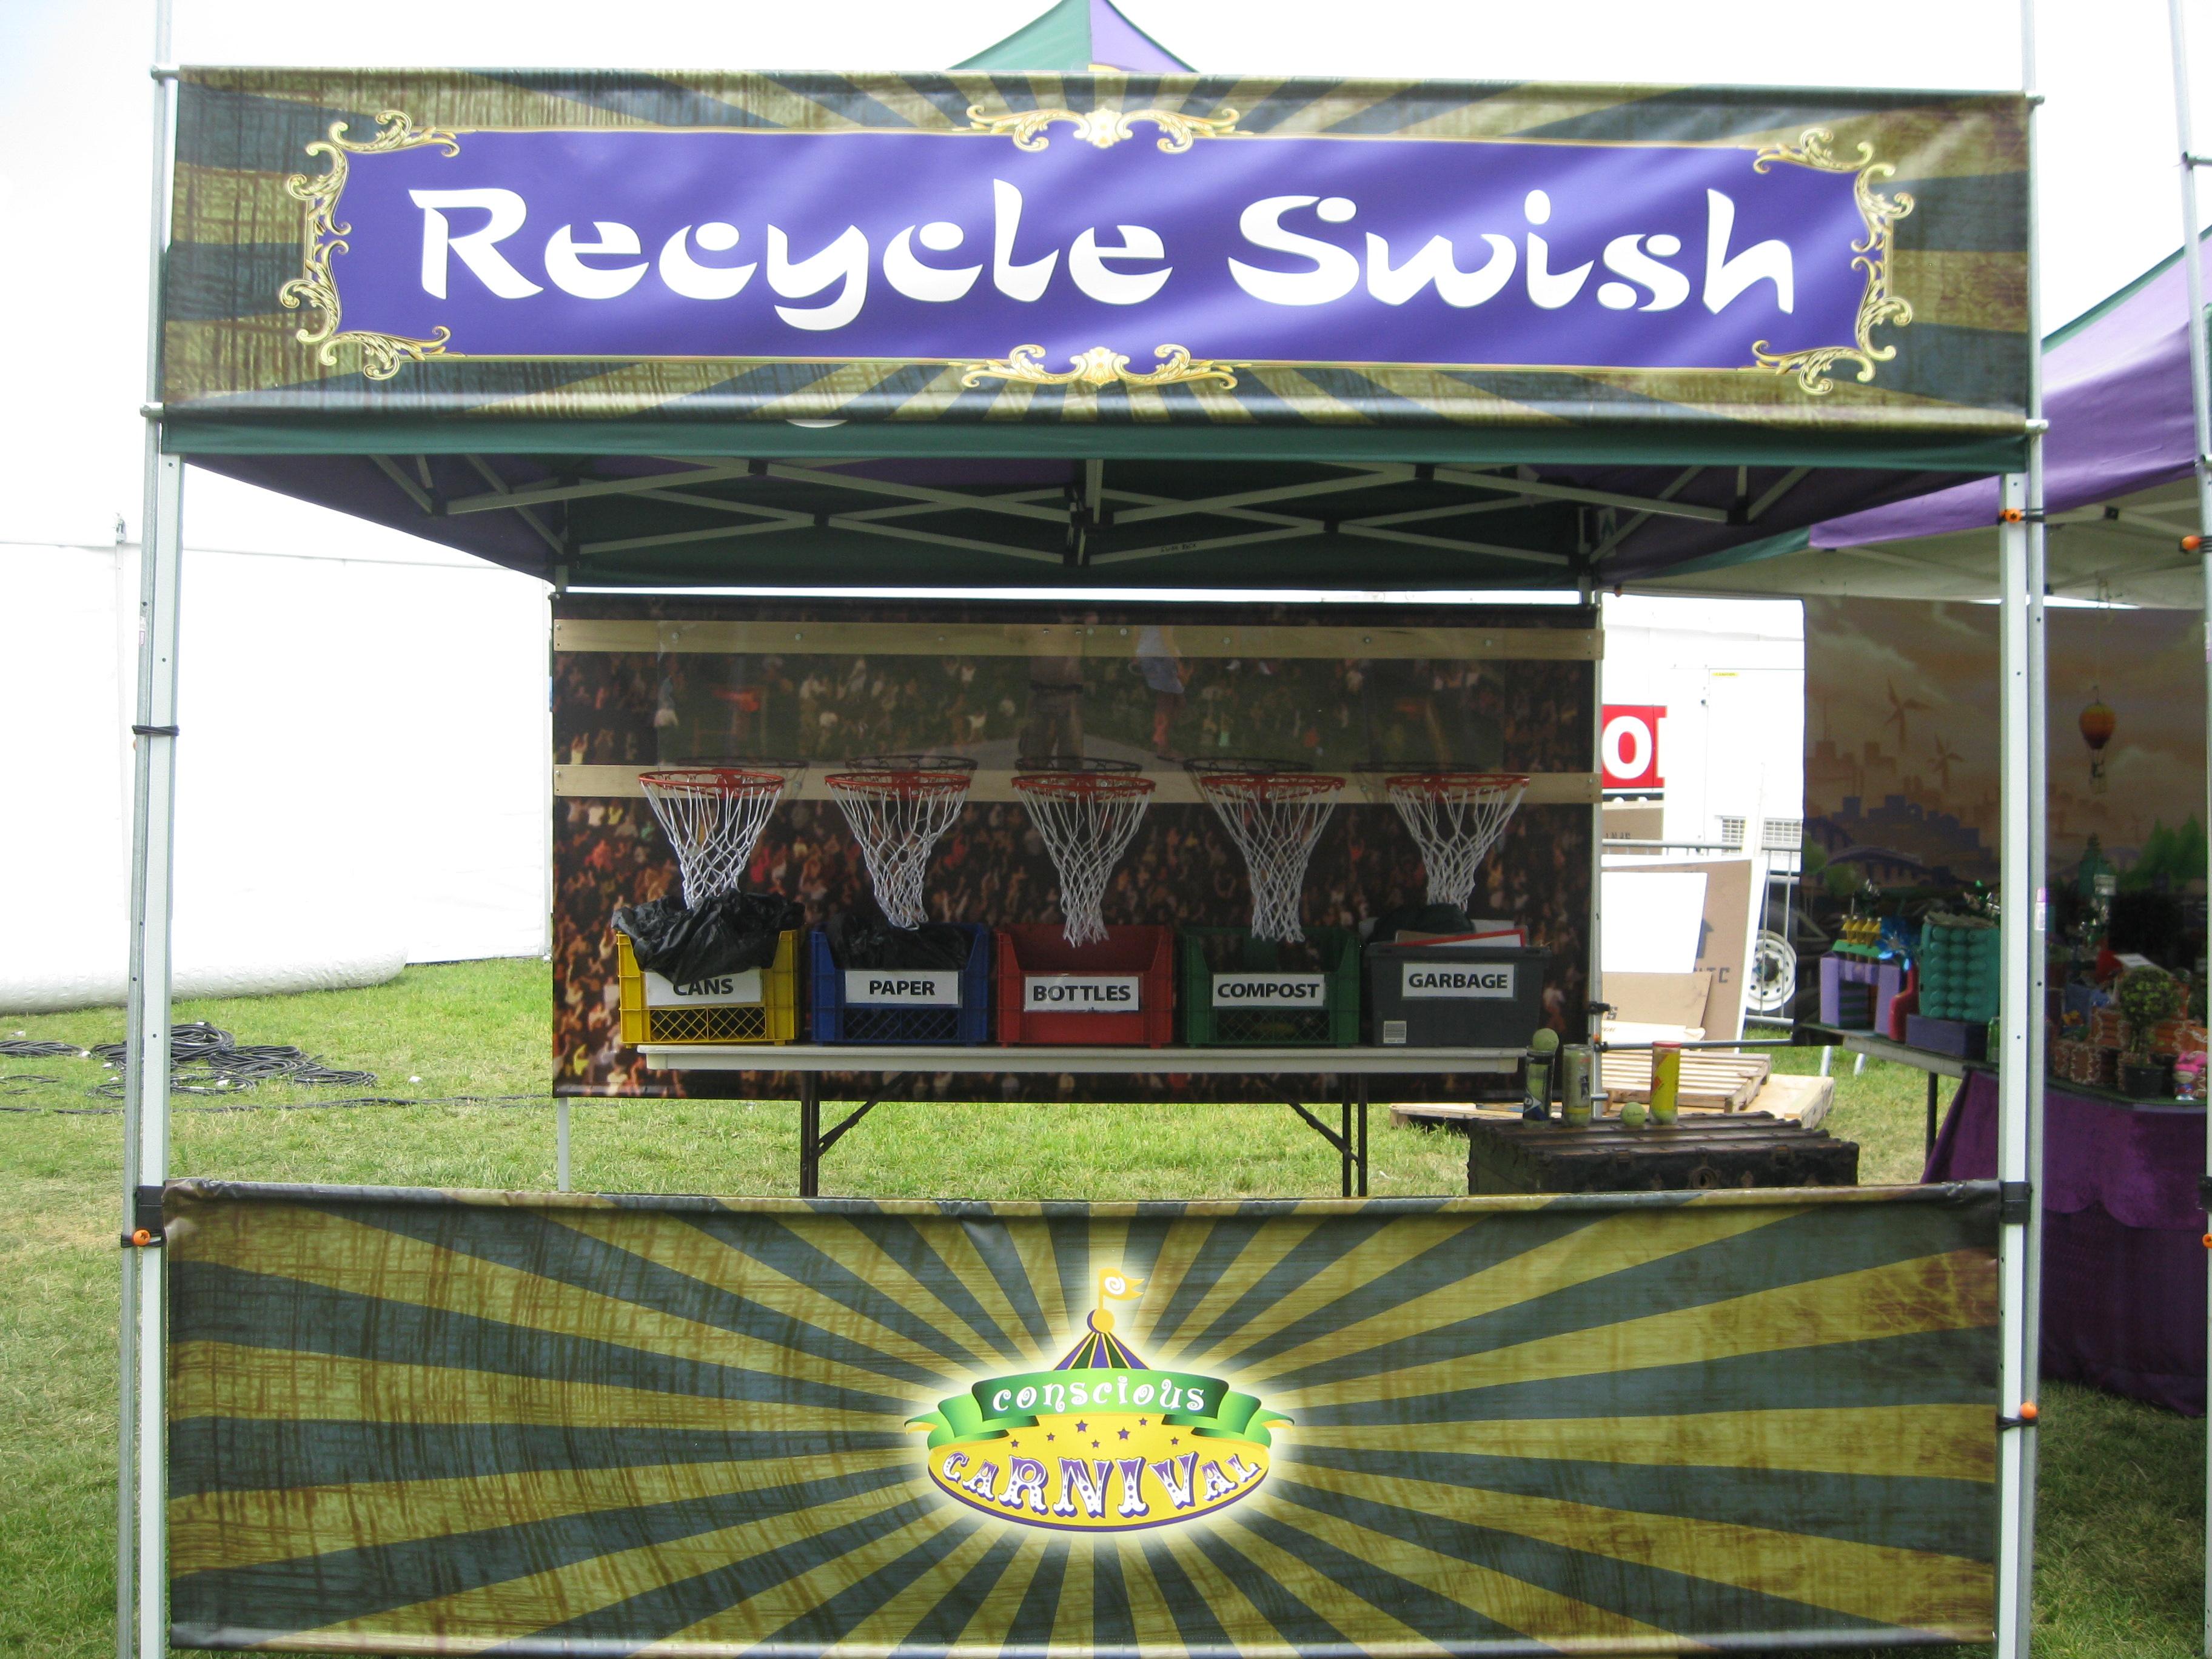 Recycle Swish